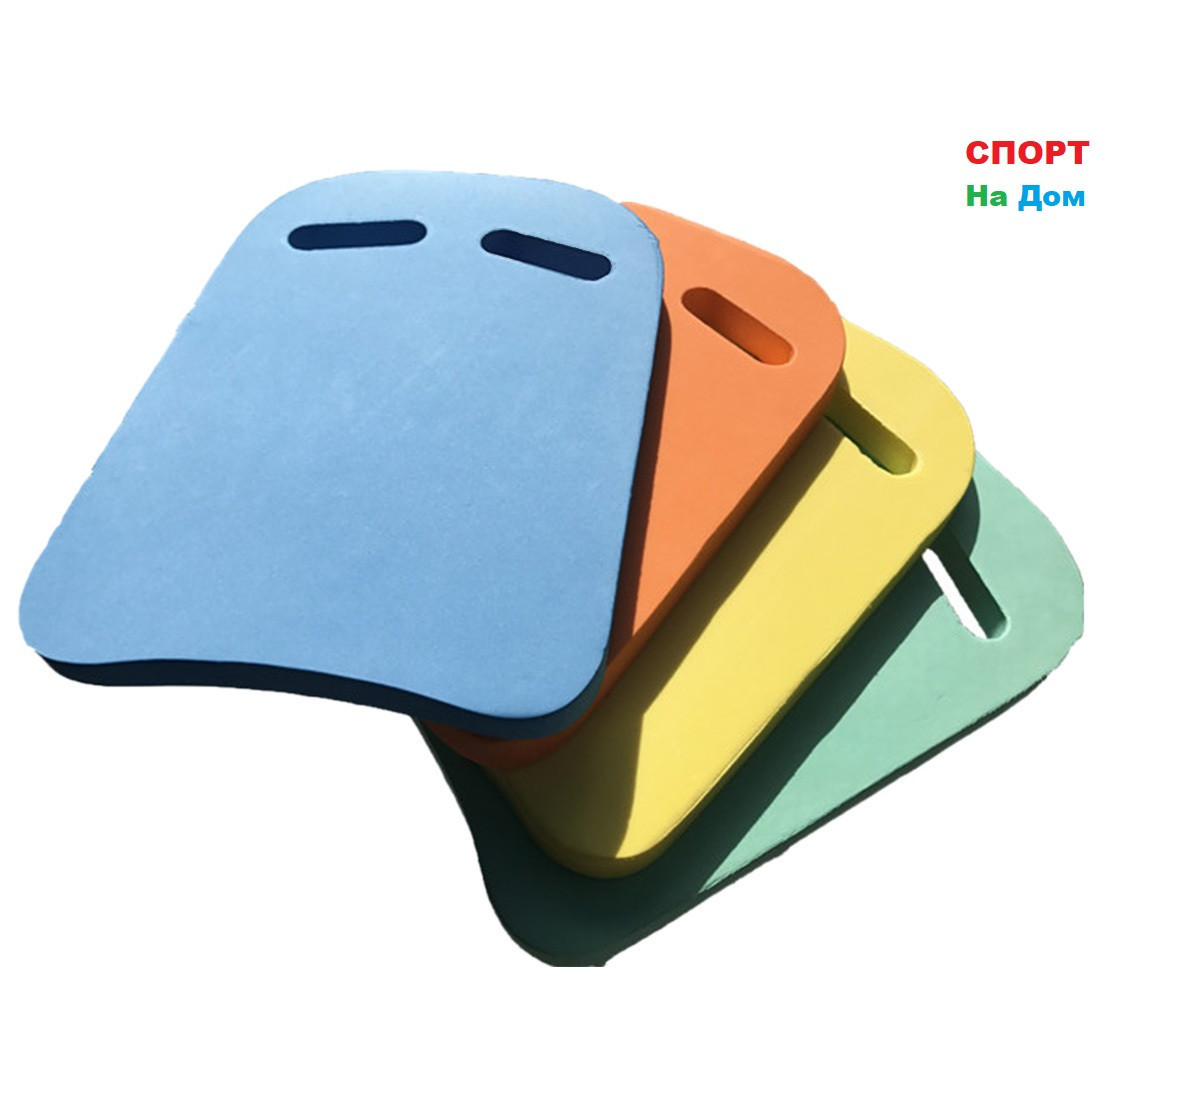 Доска для плавания Kickboard (цвет зеленый с желтым)